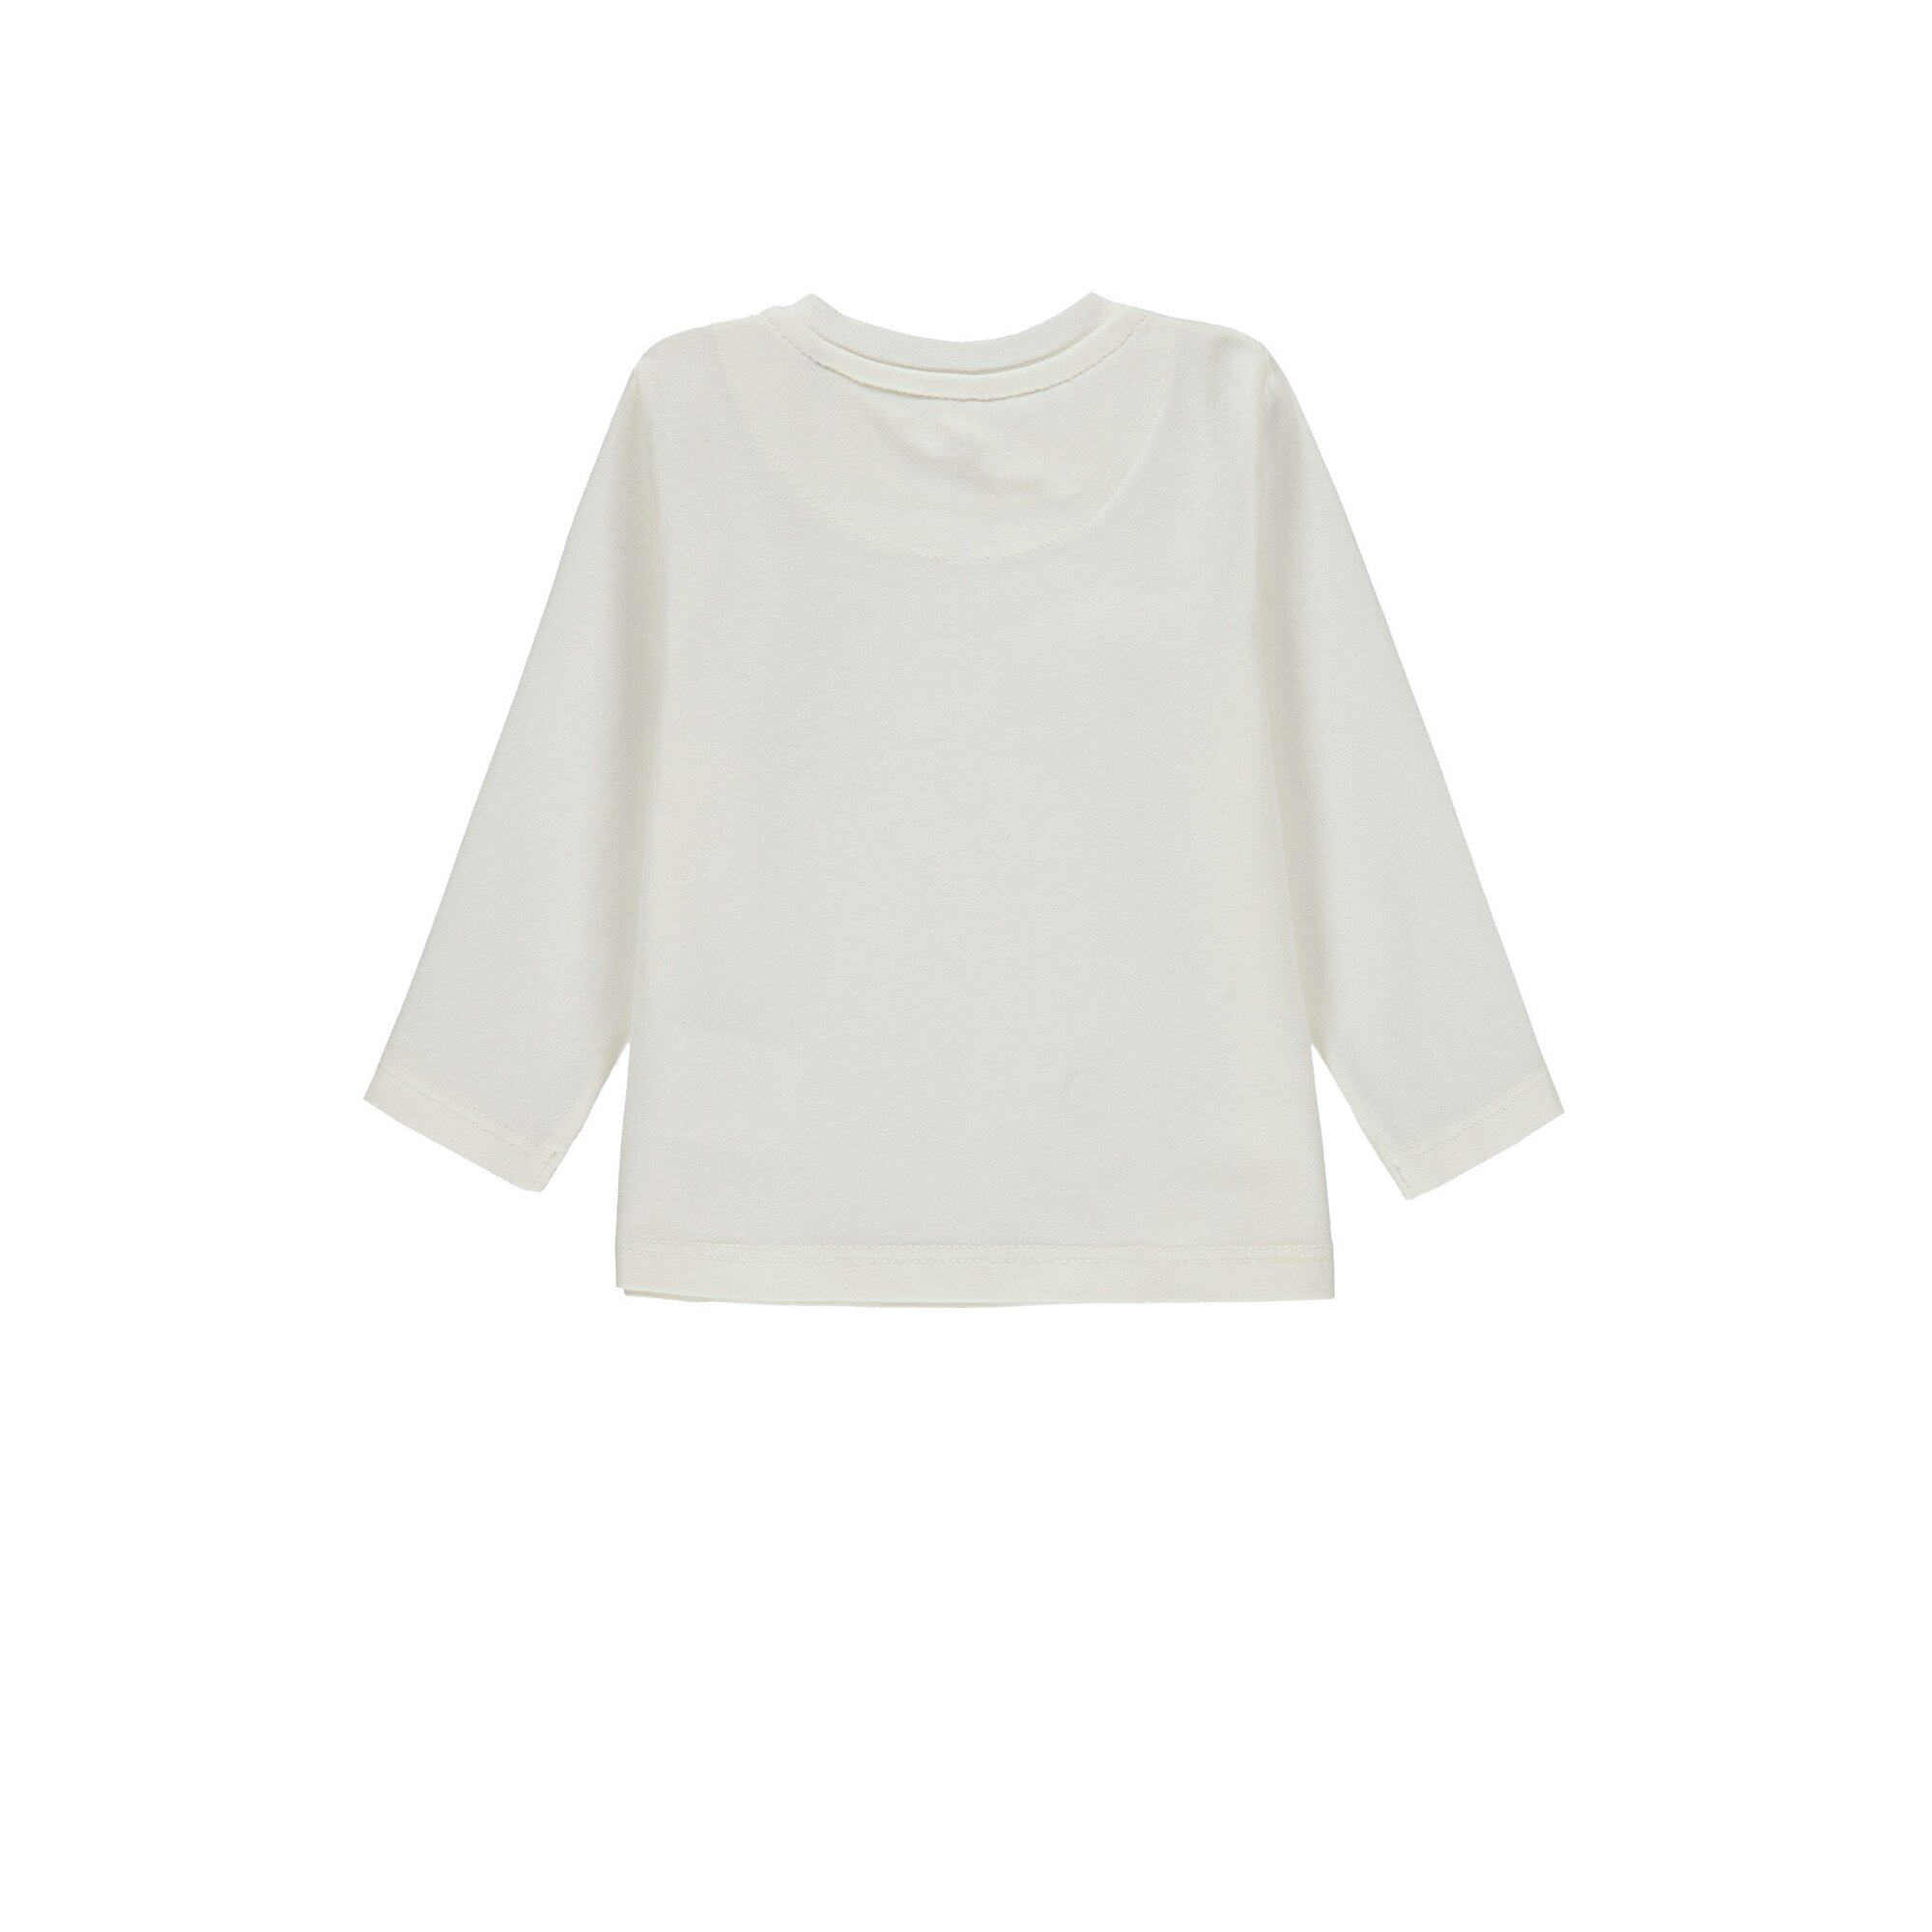 bellybutton-baby-langarmshirt-mit-su-en-print, 17.95 EUR @ babywalz-de